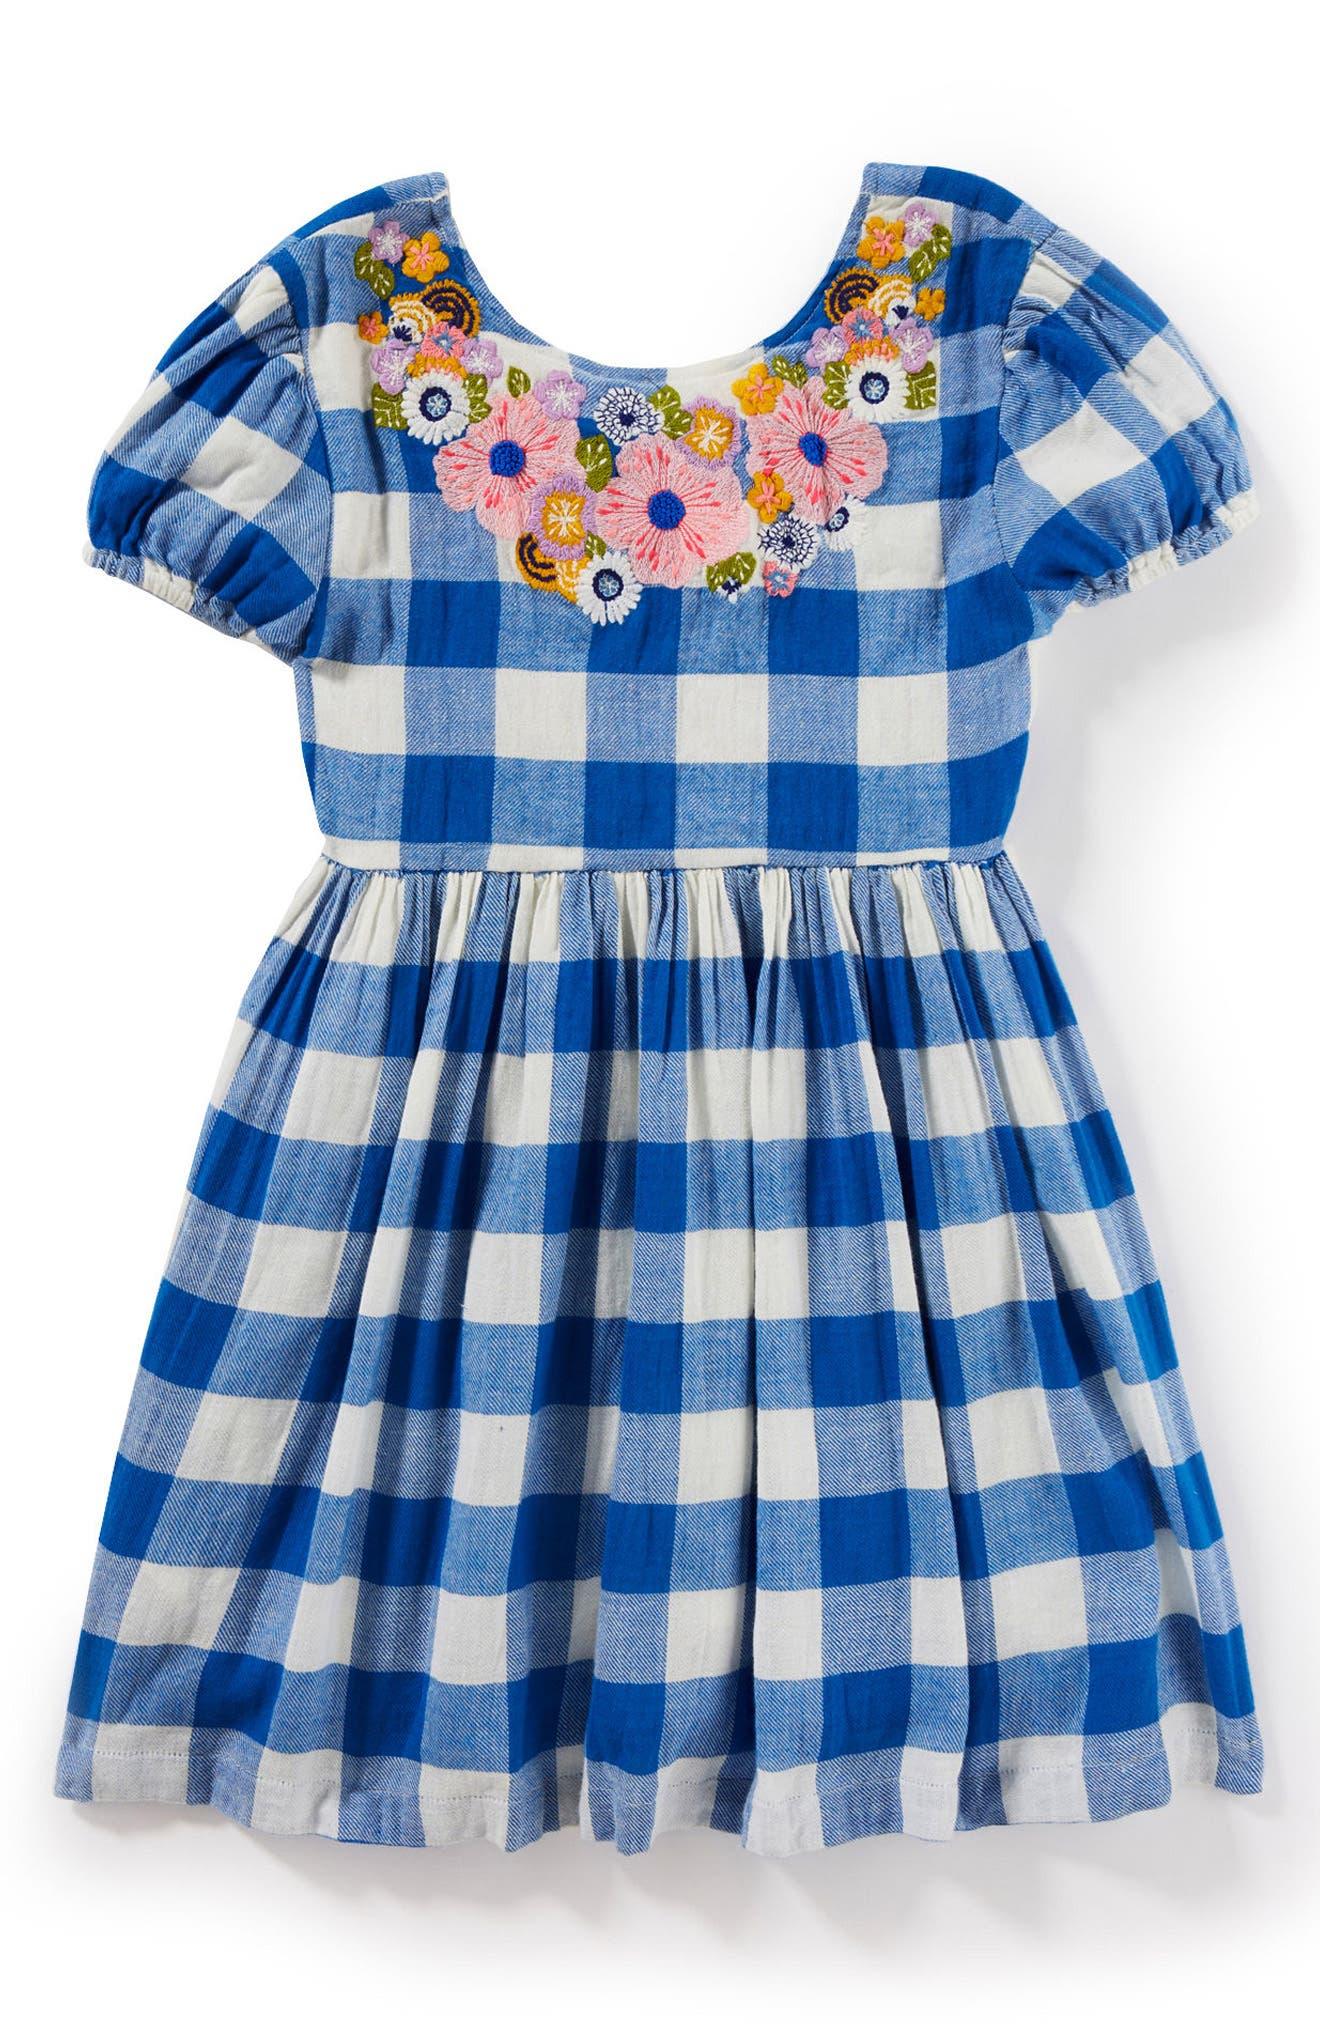 Main Image - Peek Penelope Embroidered Check Dress (Toddler Girls, Little Girls & Big Girls)